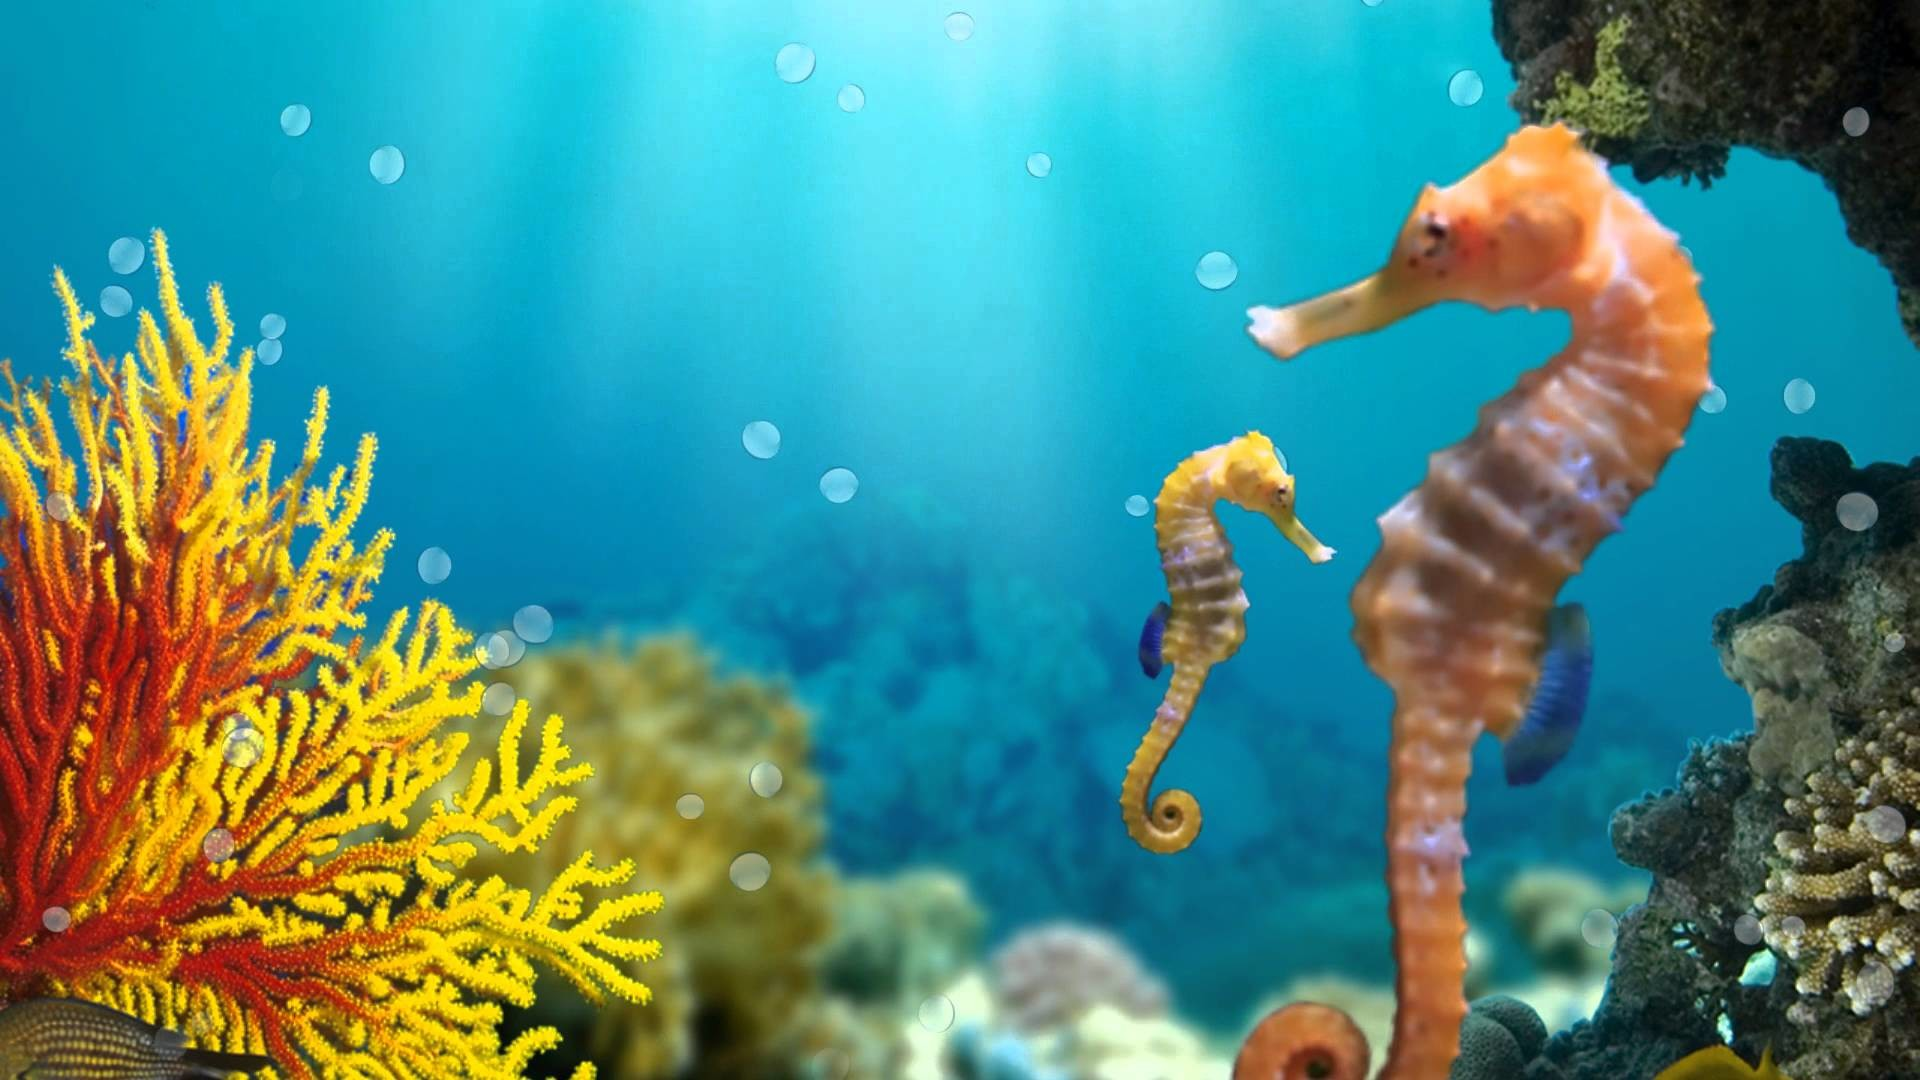 Seahorse Wallpaper ·①